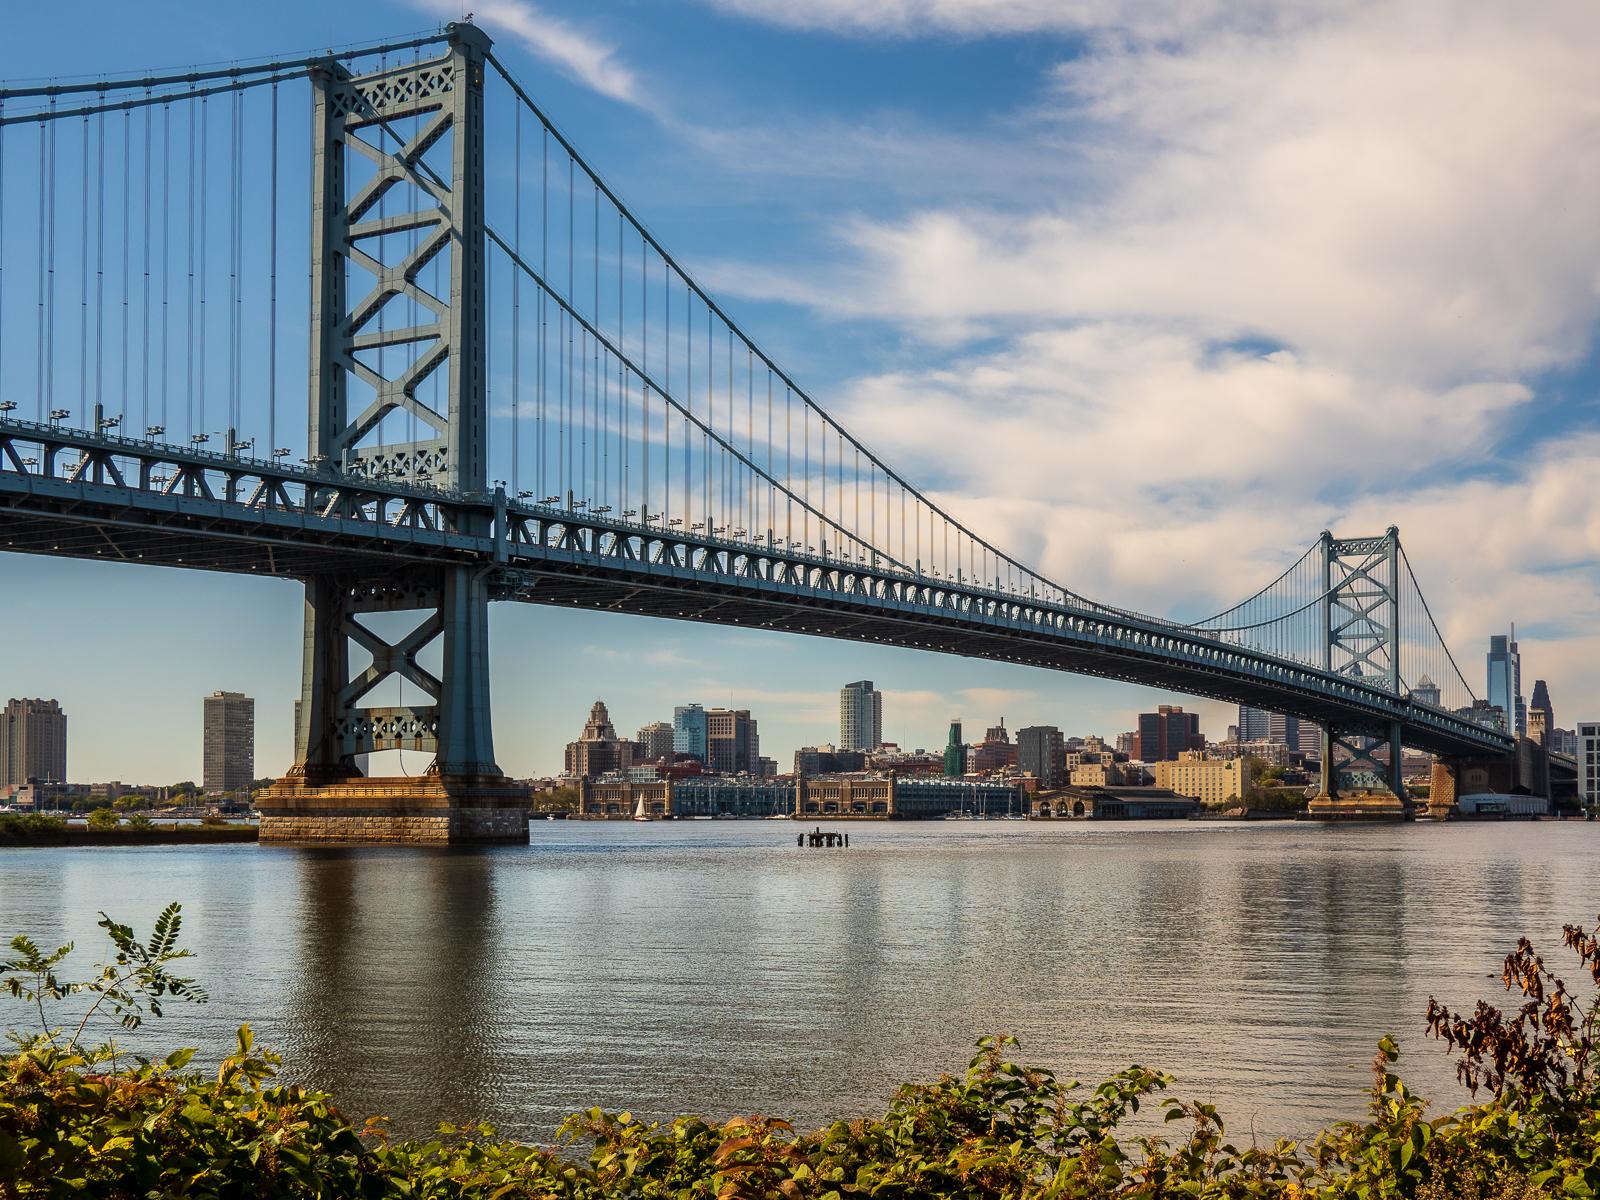 ben franklin bridge photograph